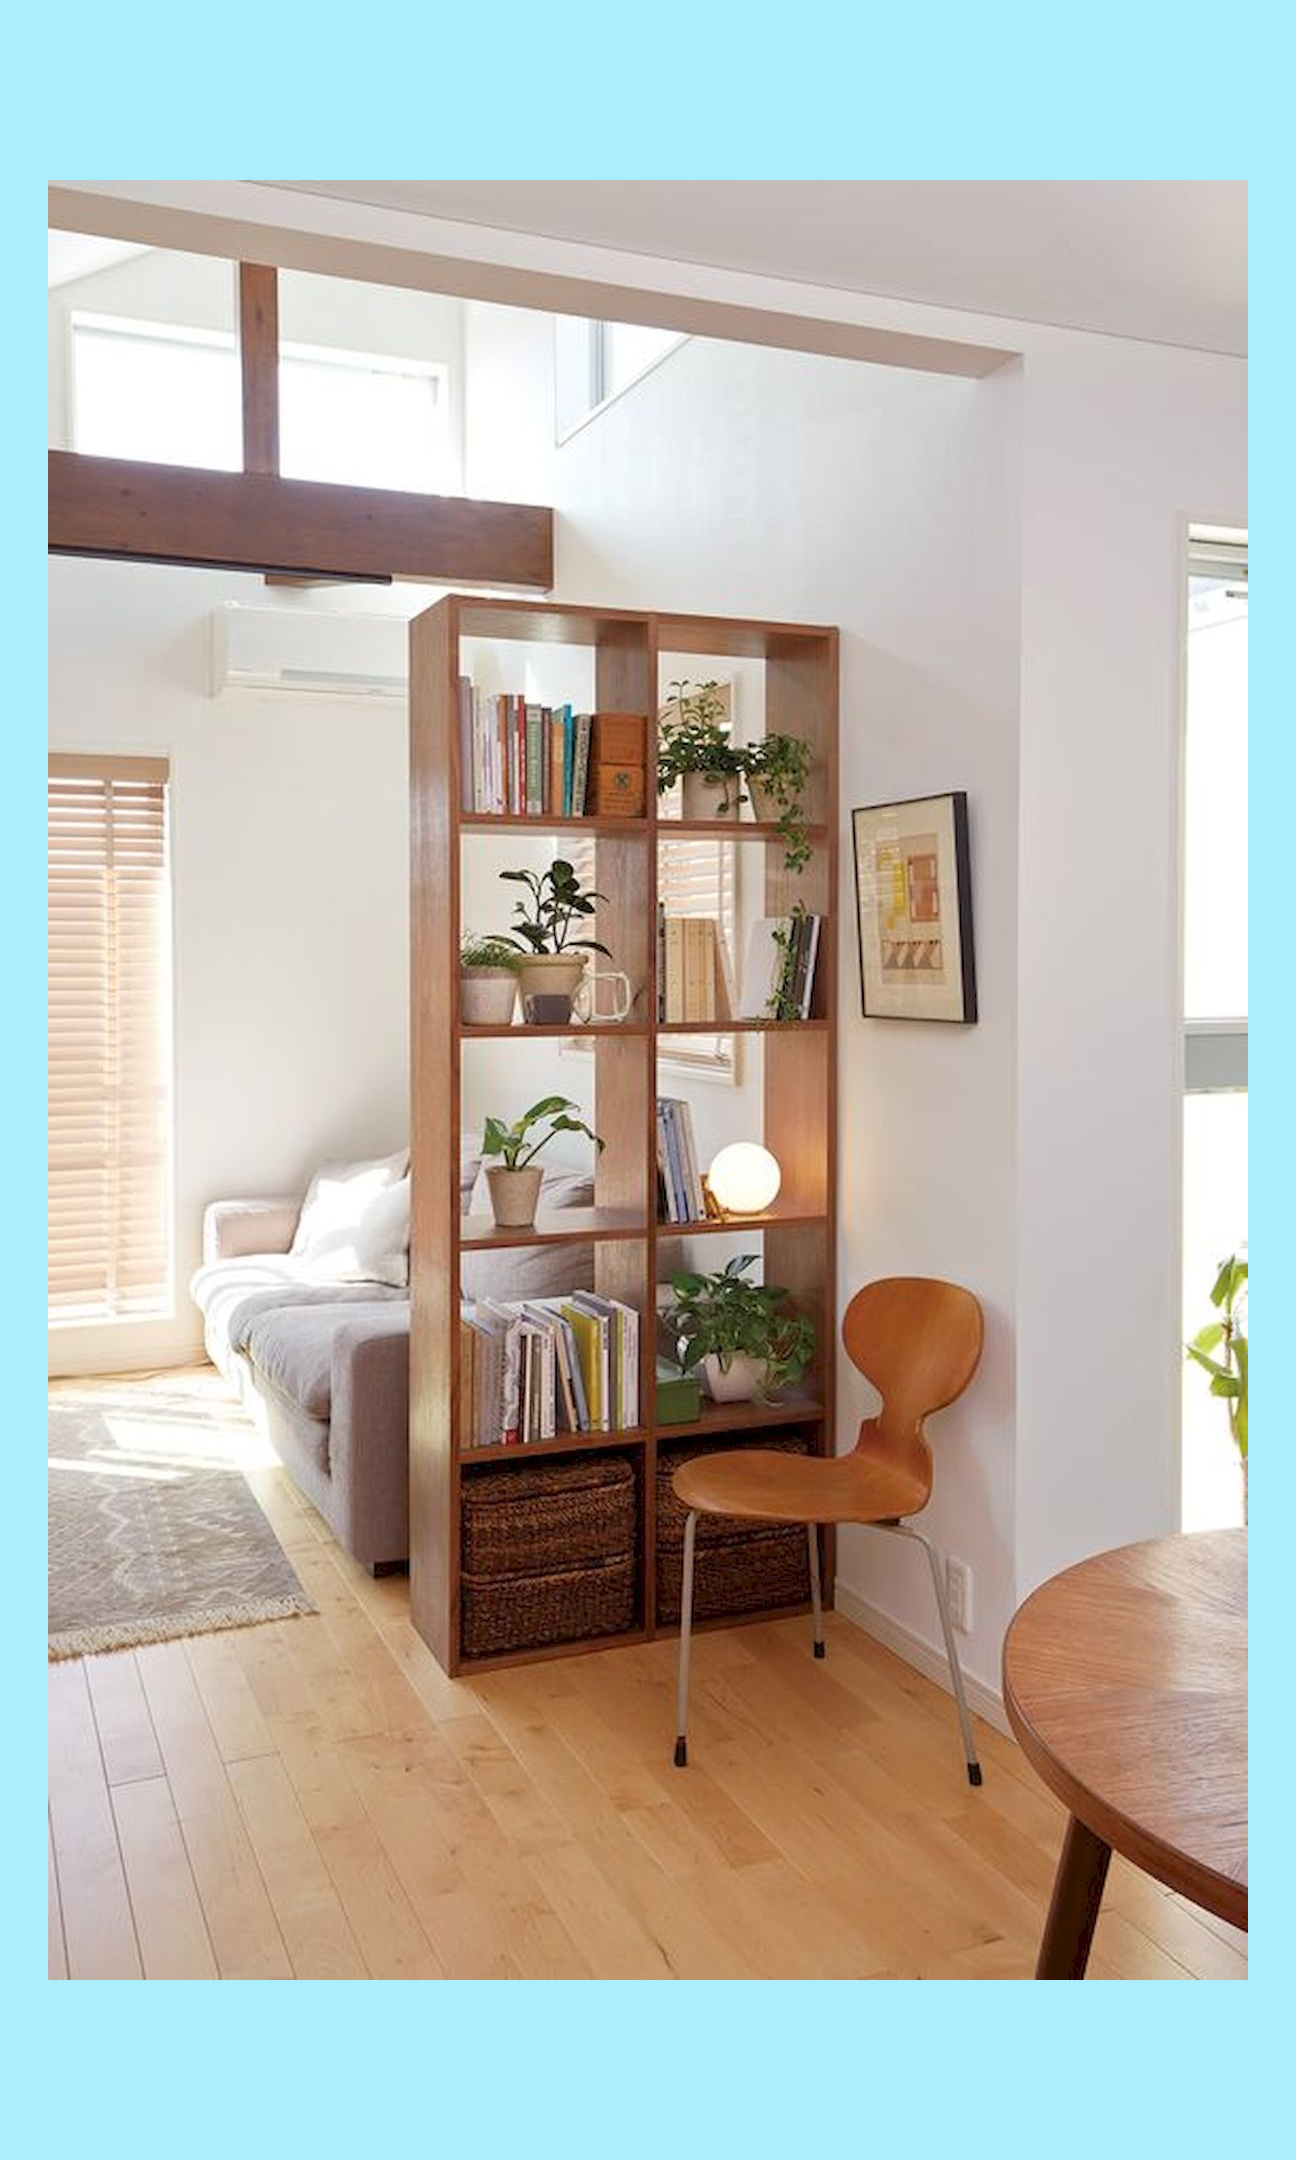 Pinterest With Images Apartment Decor Diy Apartment Decor